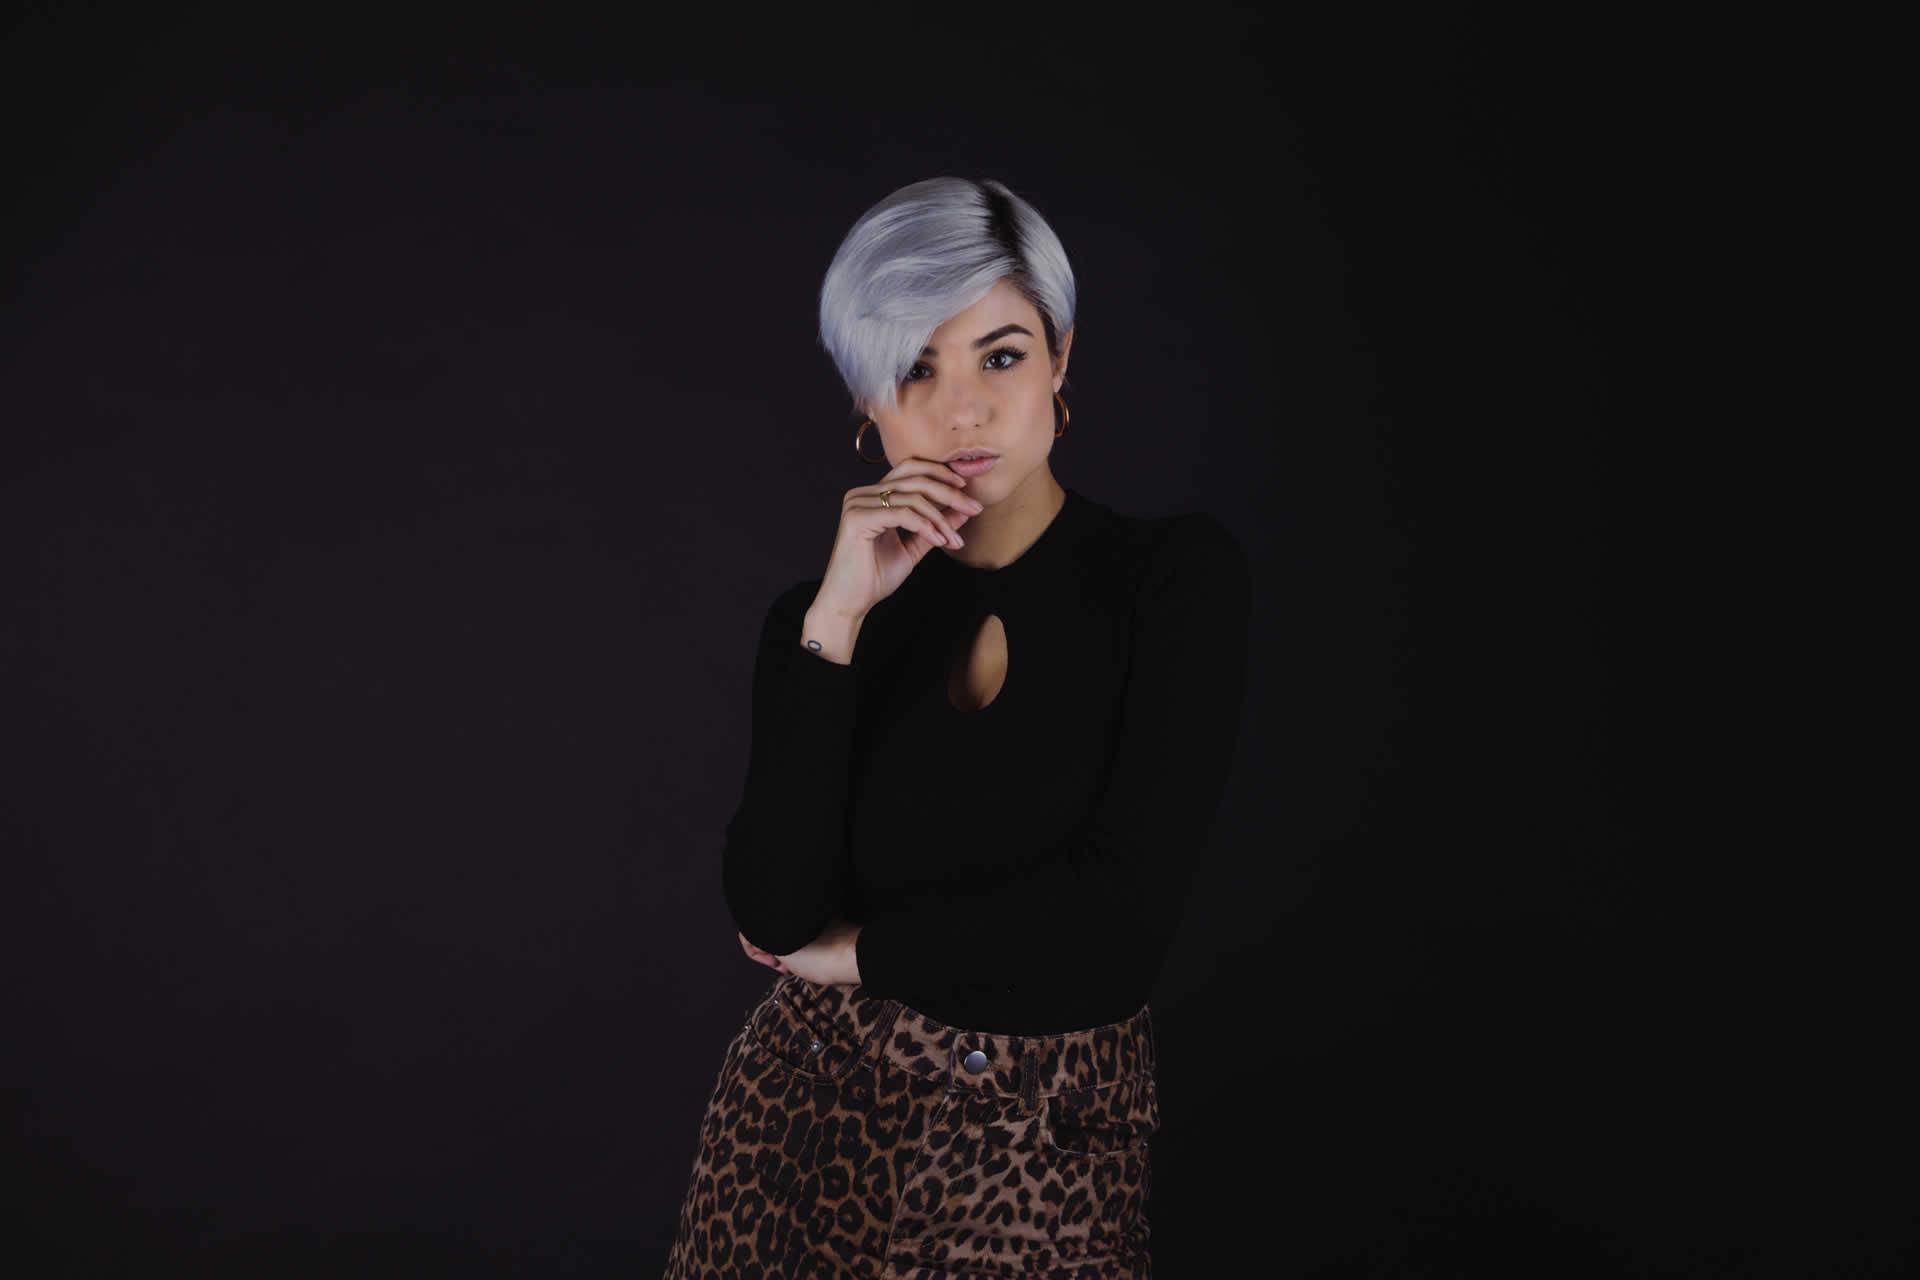 marco-viola-fotografo-bologna-slide1